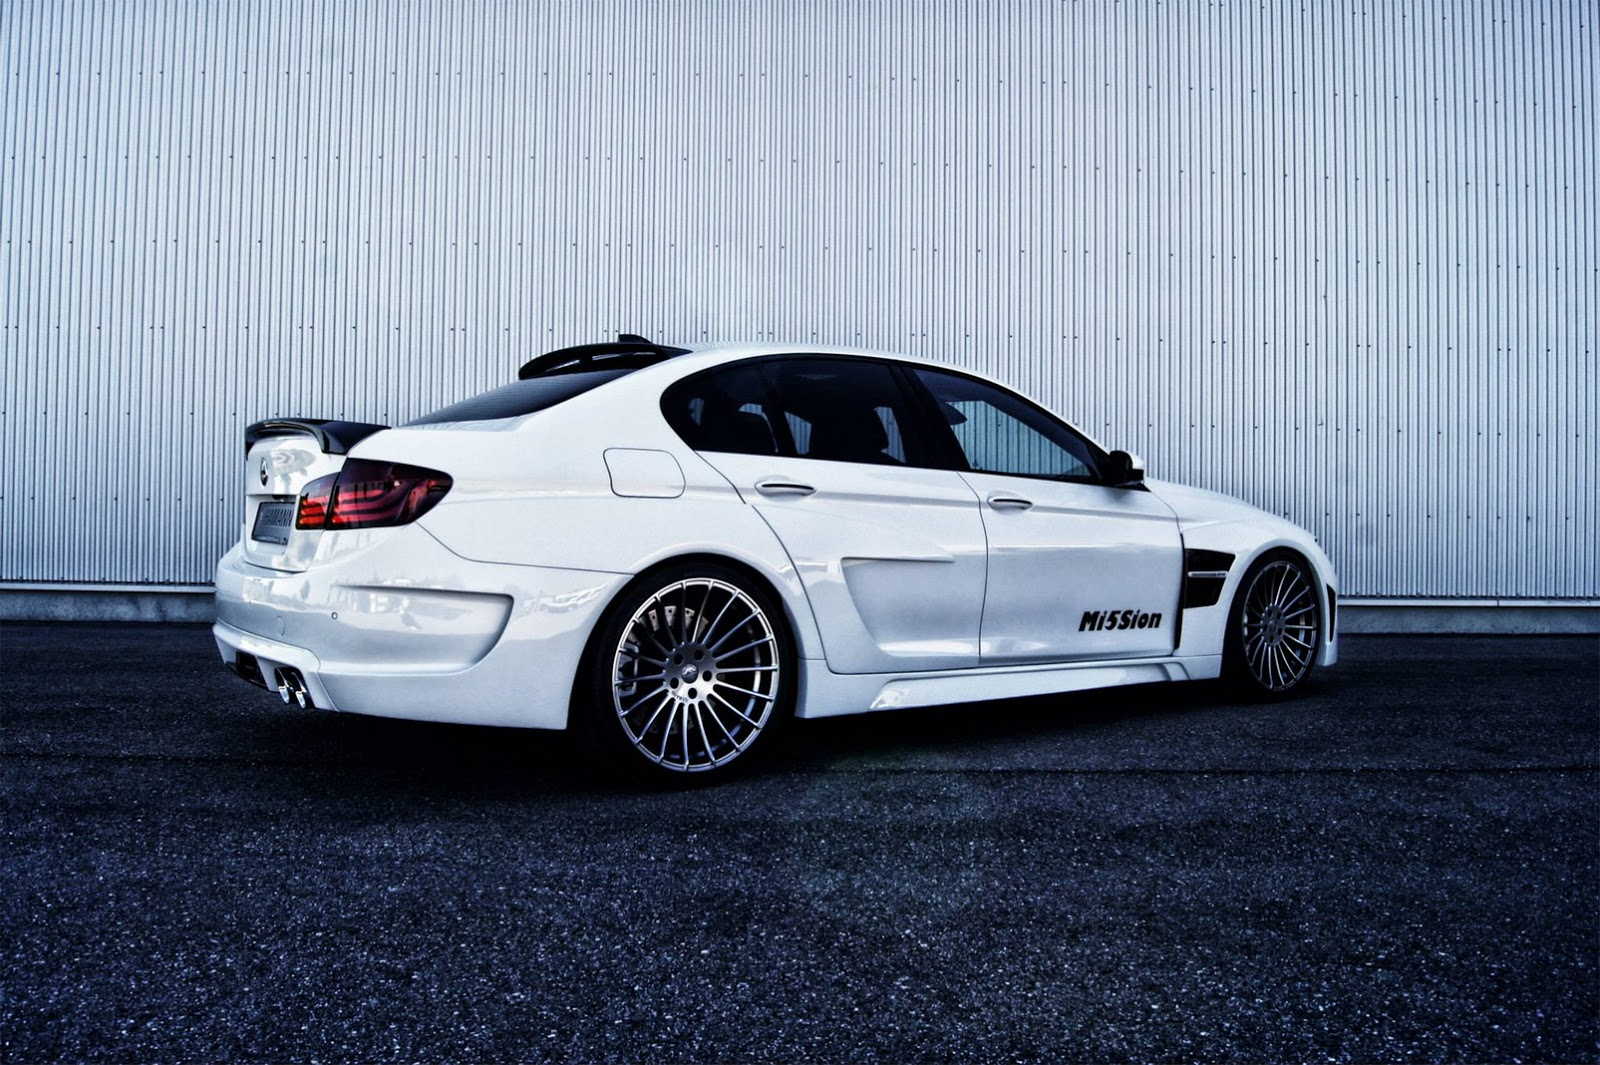 White 5 Series Bmw >> BMW Tuning: Hamann-tuned BMW M5 Mi5Sion